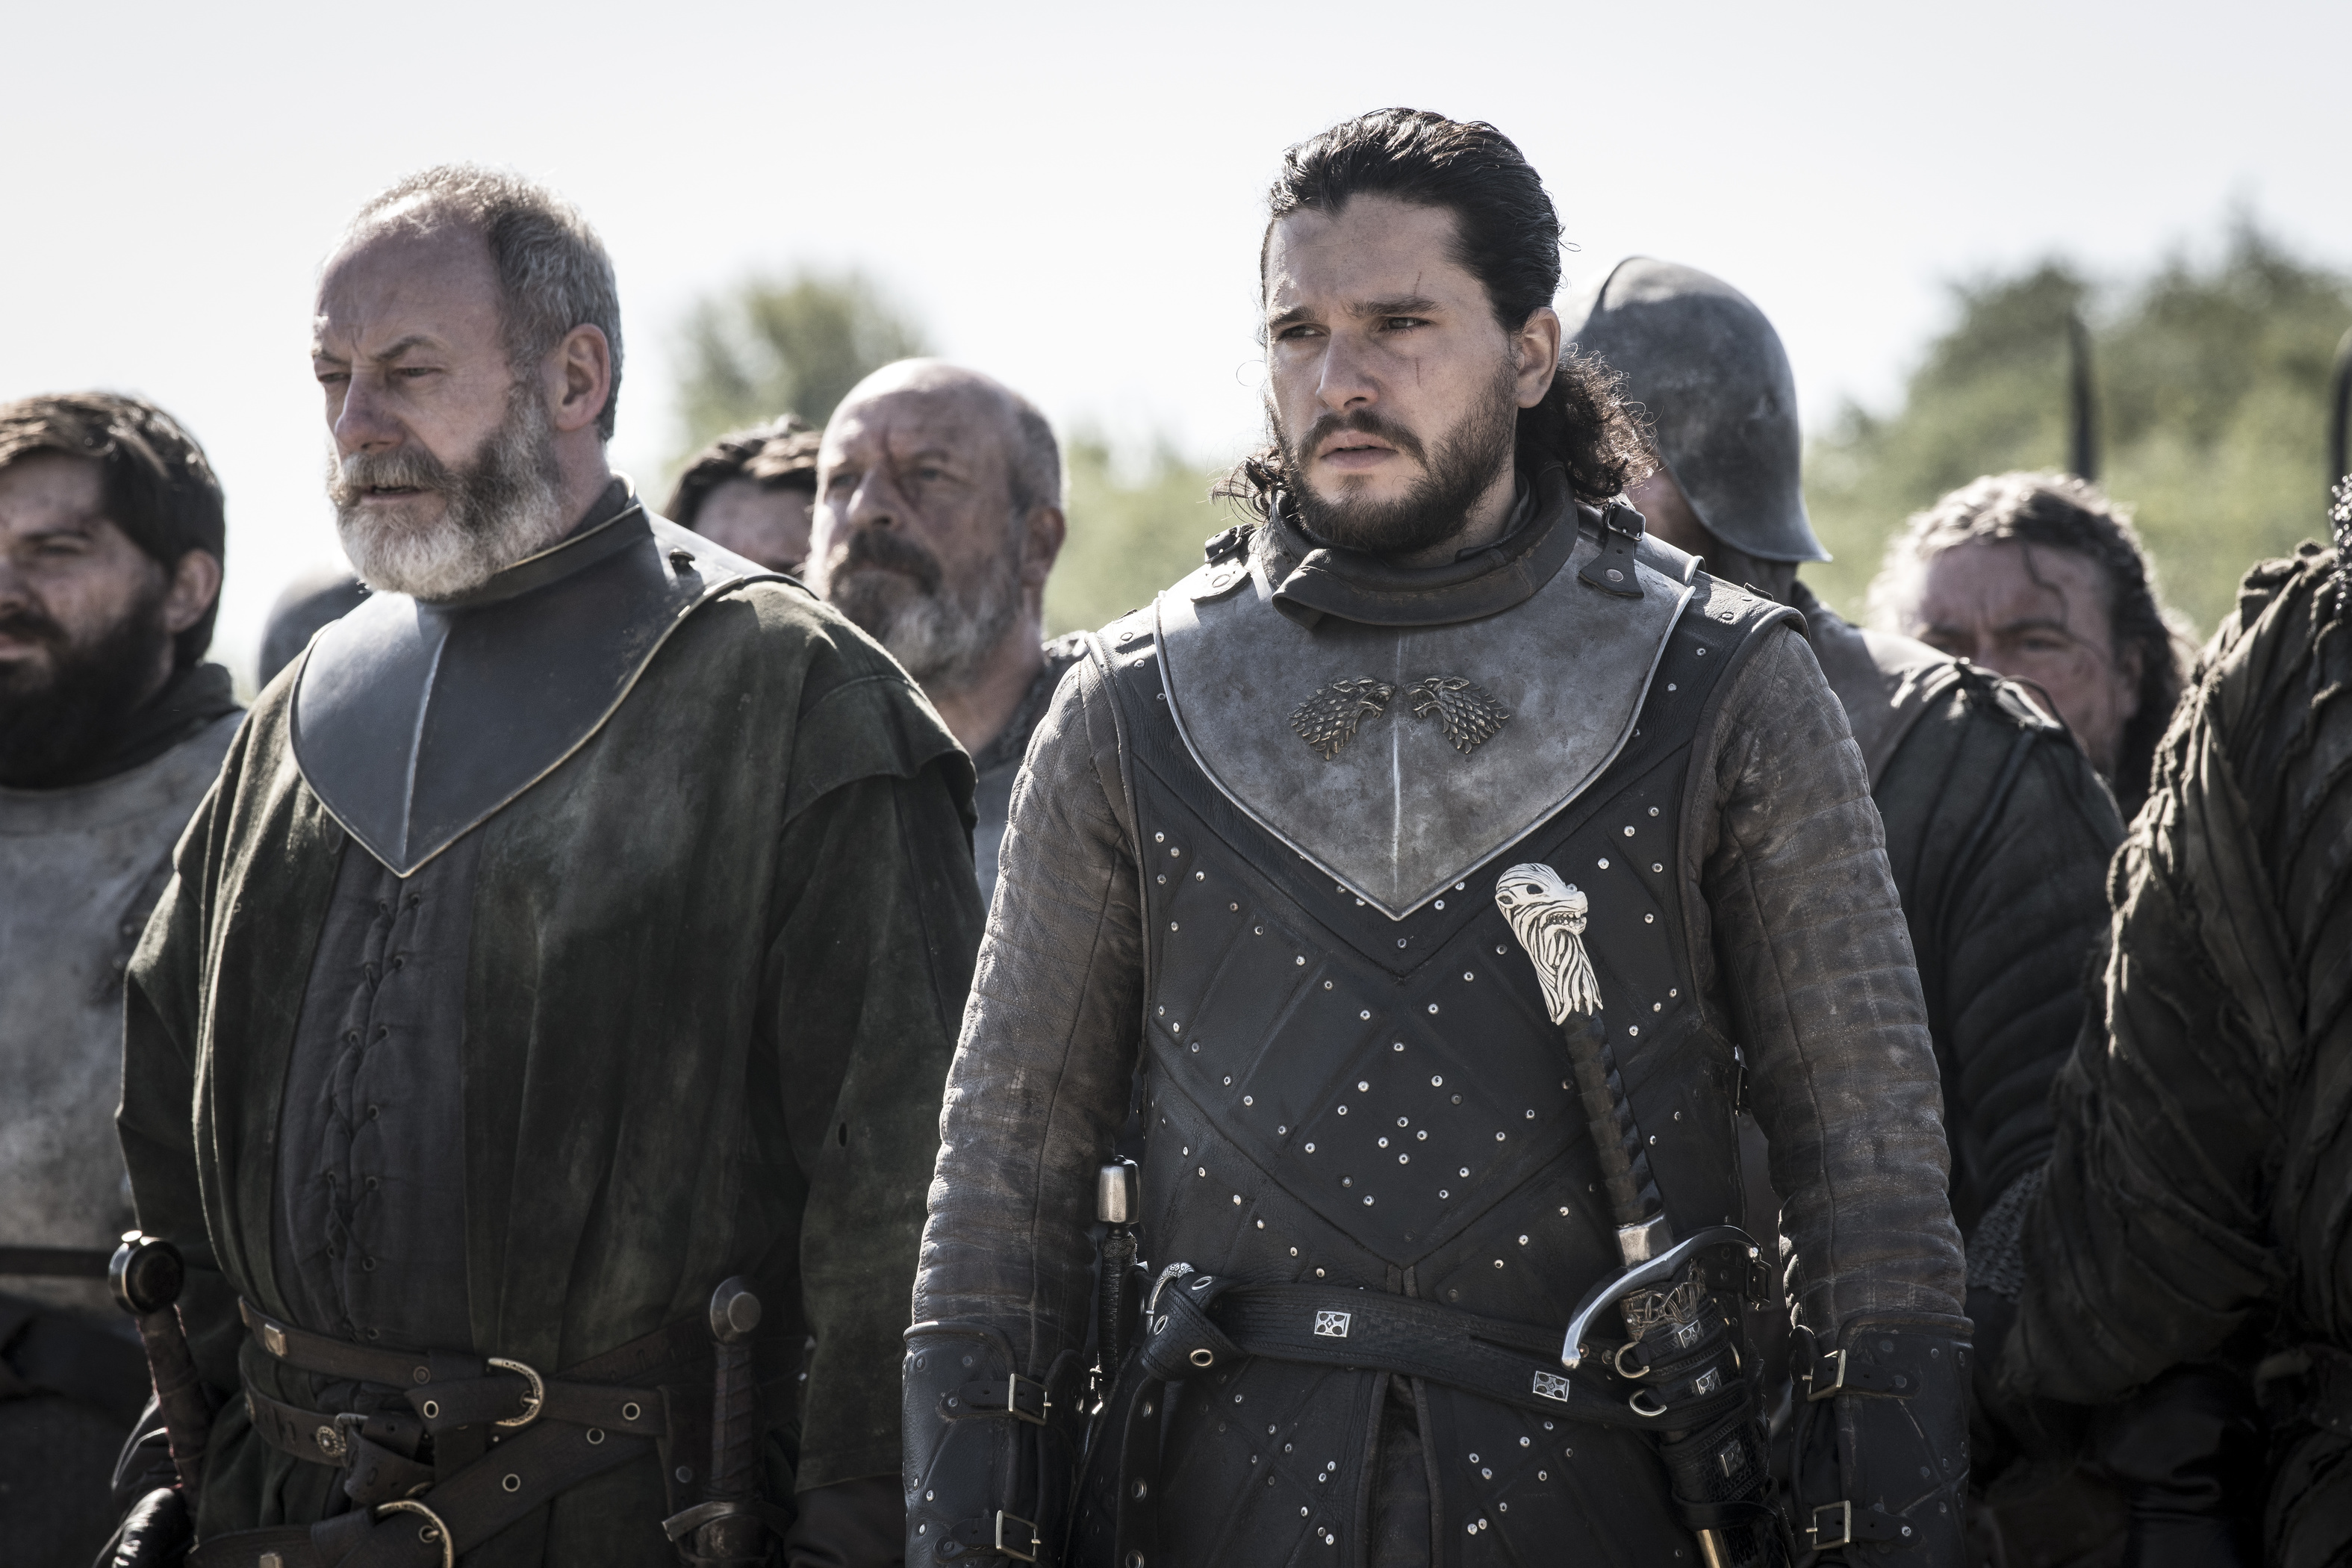 Liam Cunningham as Davos Seaworth and Kit Harington as Jon Snow.